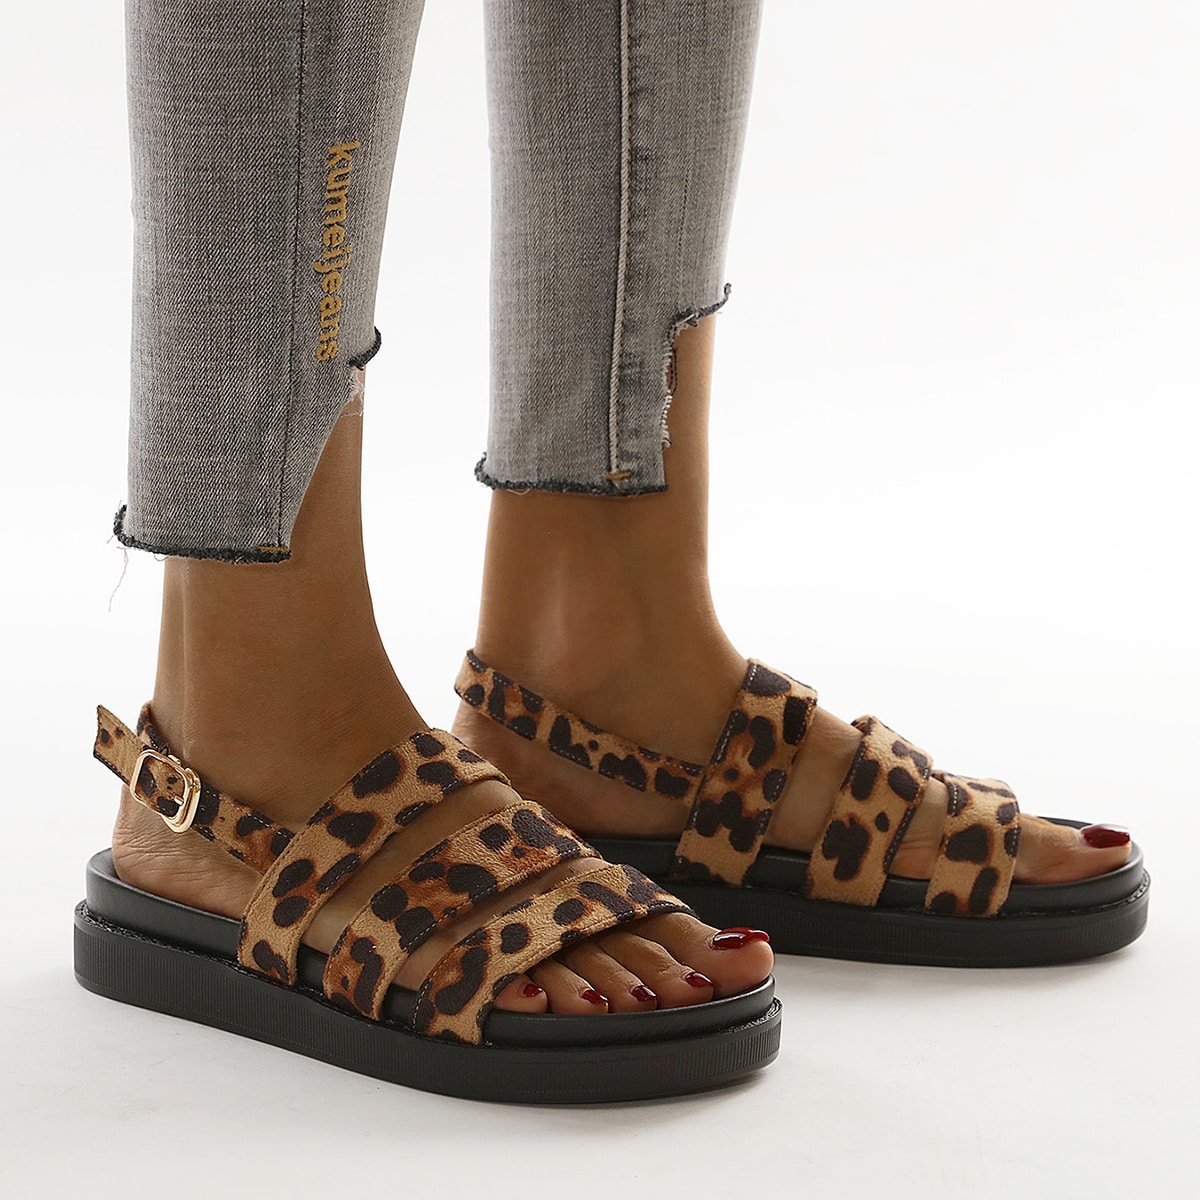 Leopard Slingback Sandals